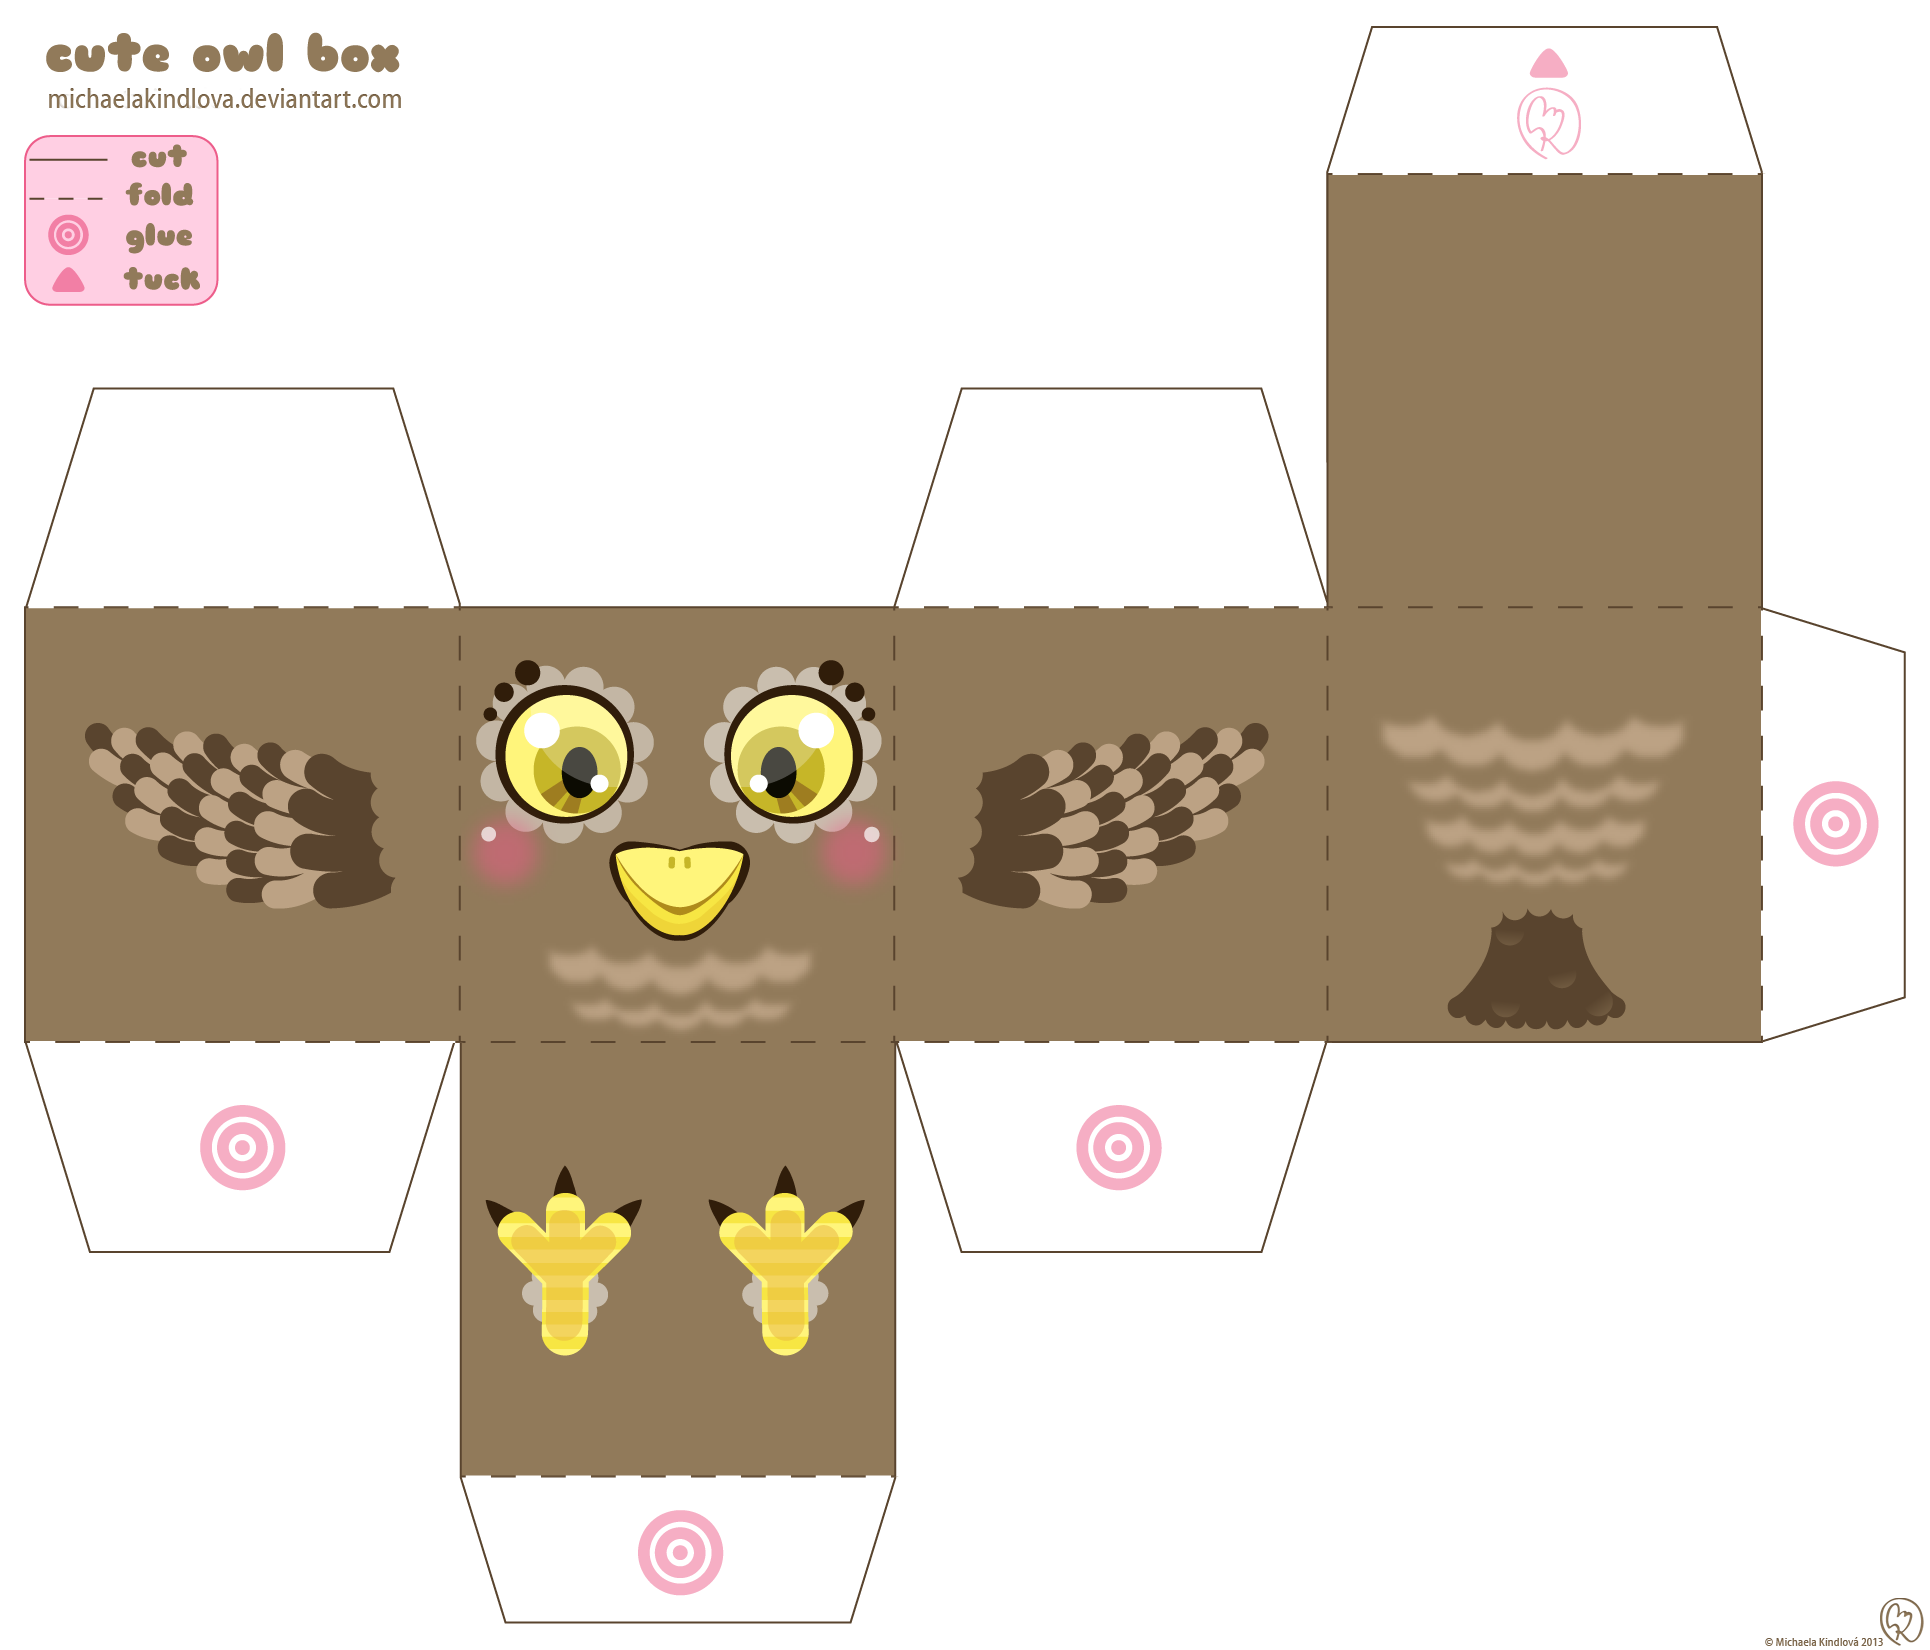 Cute Owl Box By Michaelakindlova On Deviantart